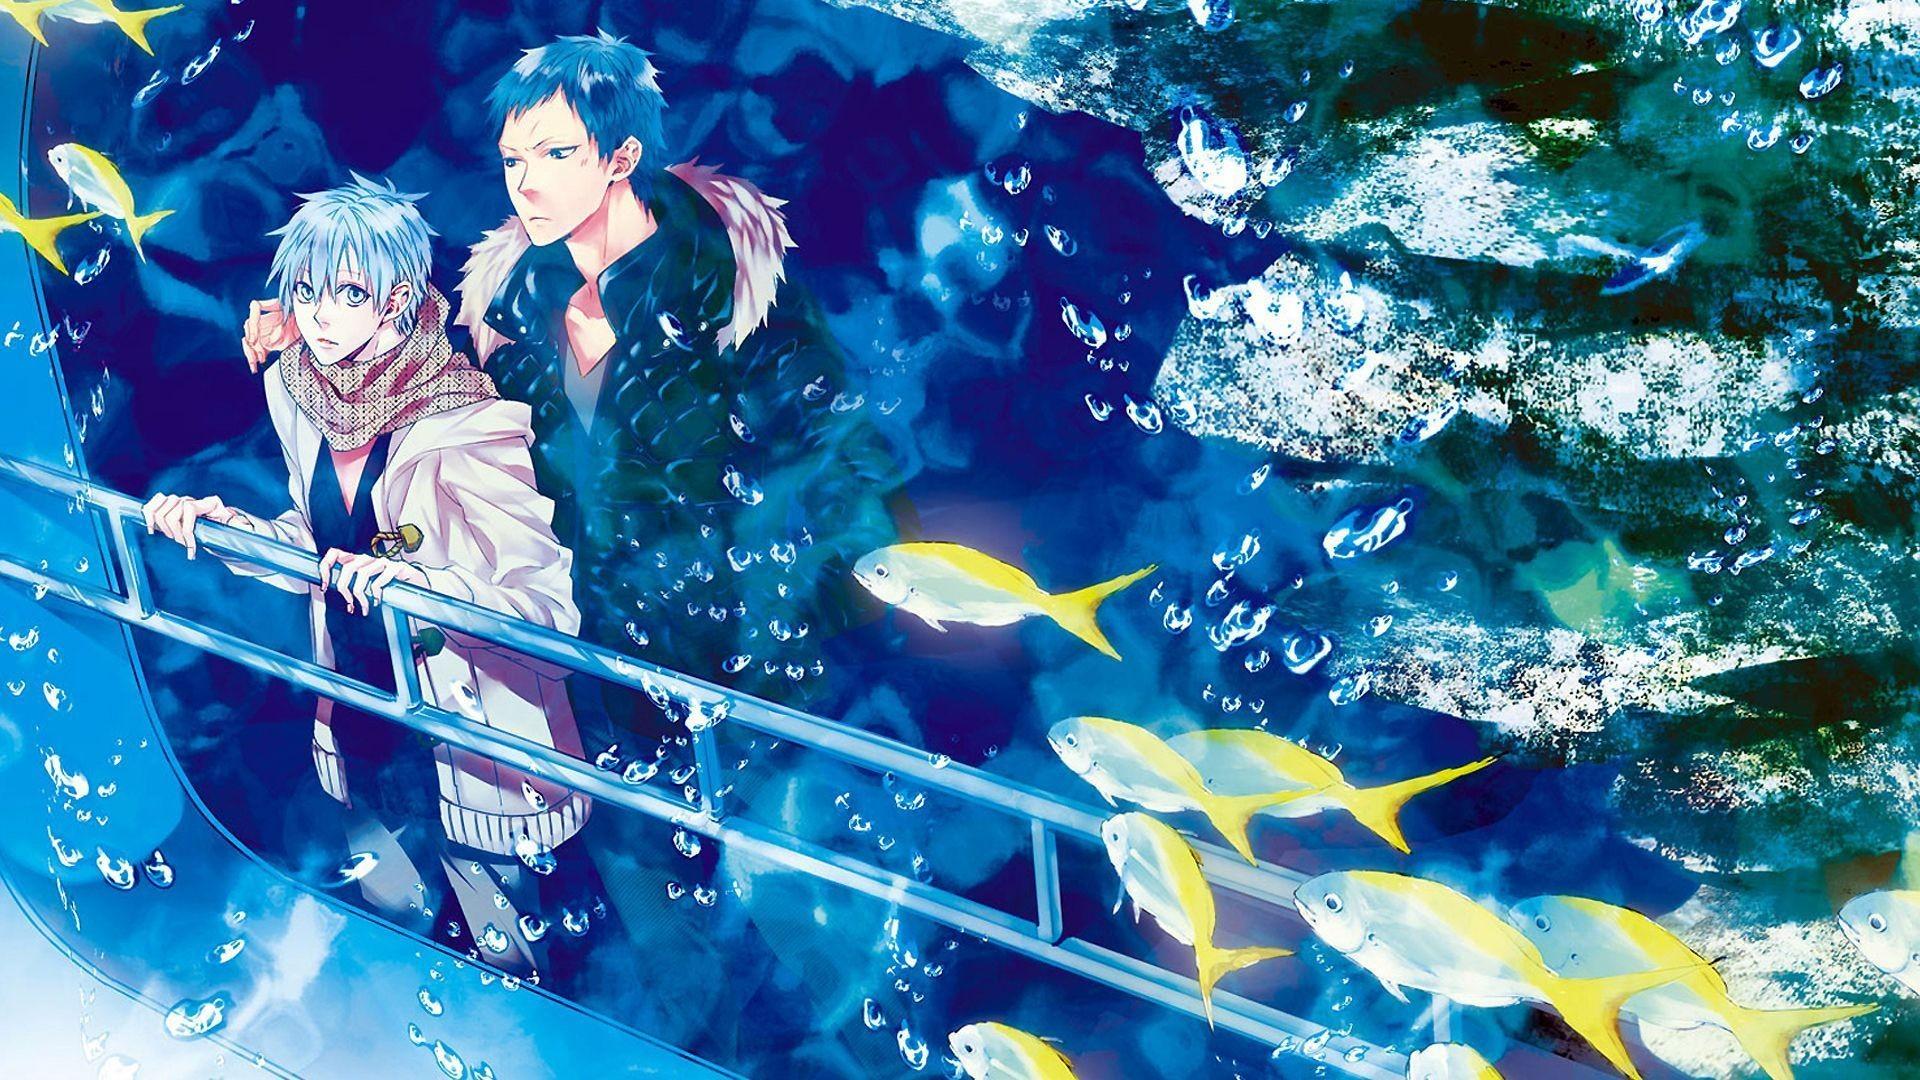 Aomine Daiki Tetsuya Kuroko No Basuke Anime Wallpaper HD .